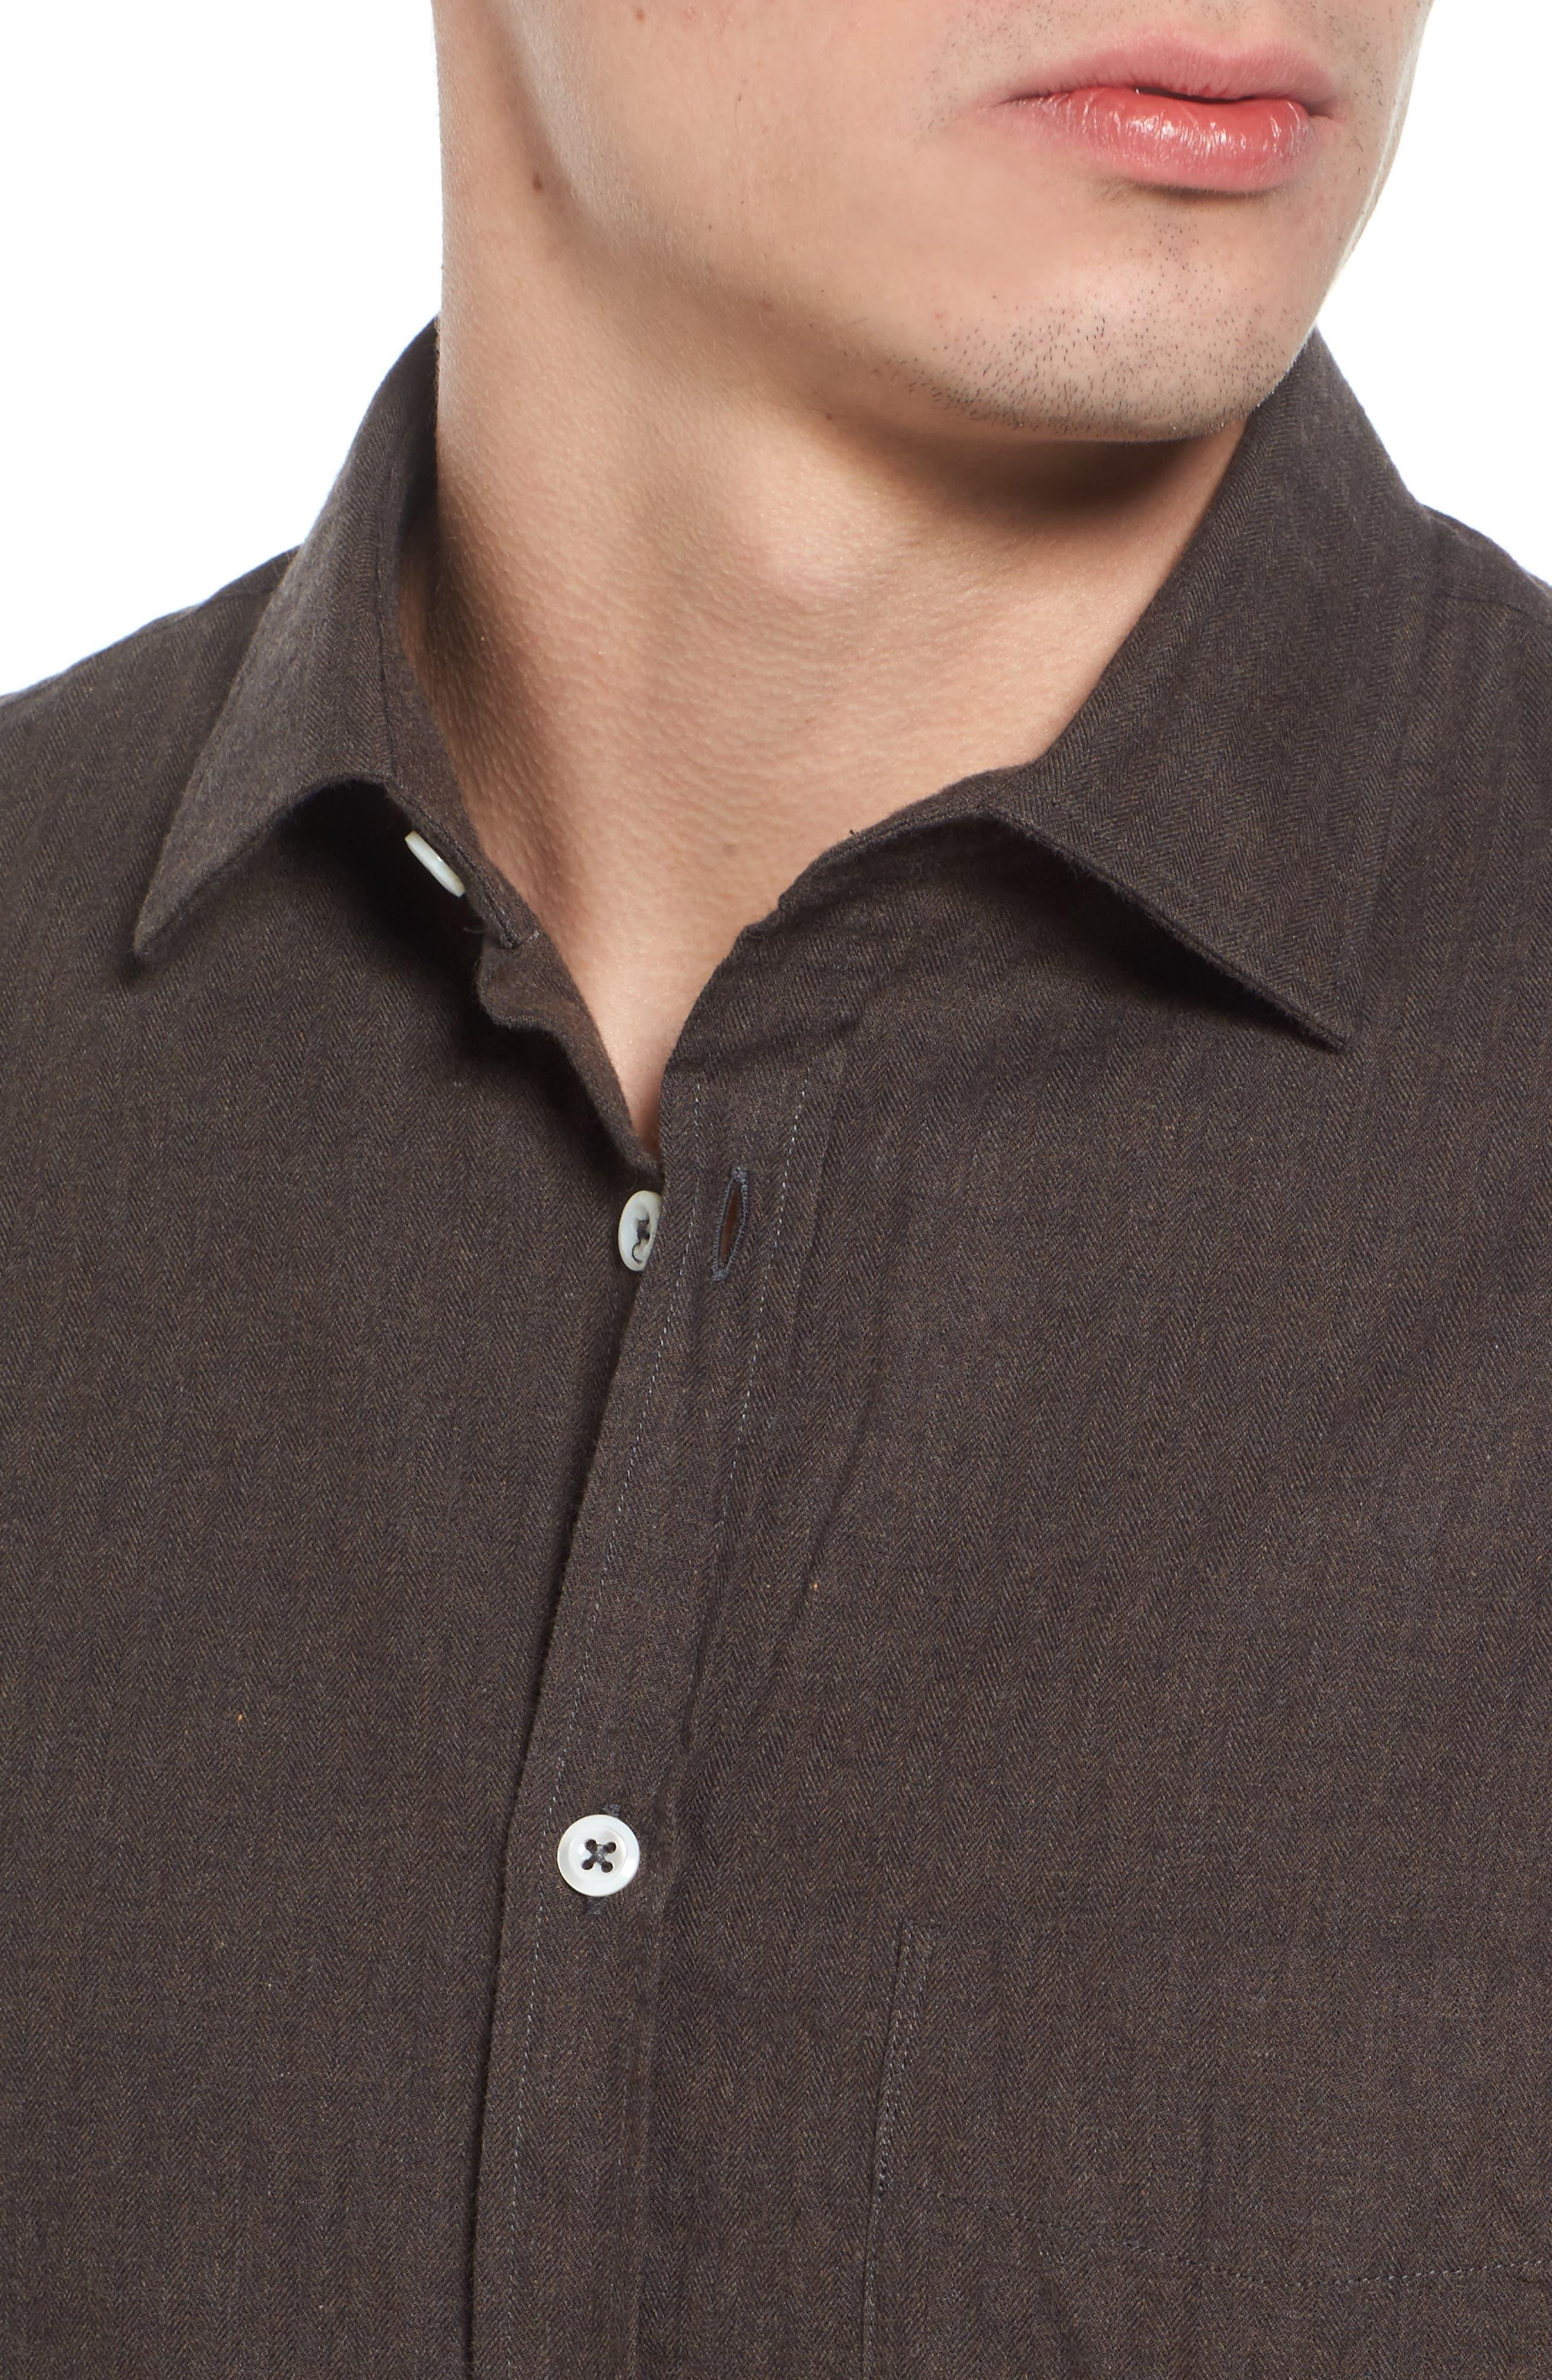 John T Standard Fit Herringbone Shirt,                             Alternate thumbnail 4, color,                             200